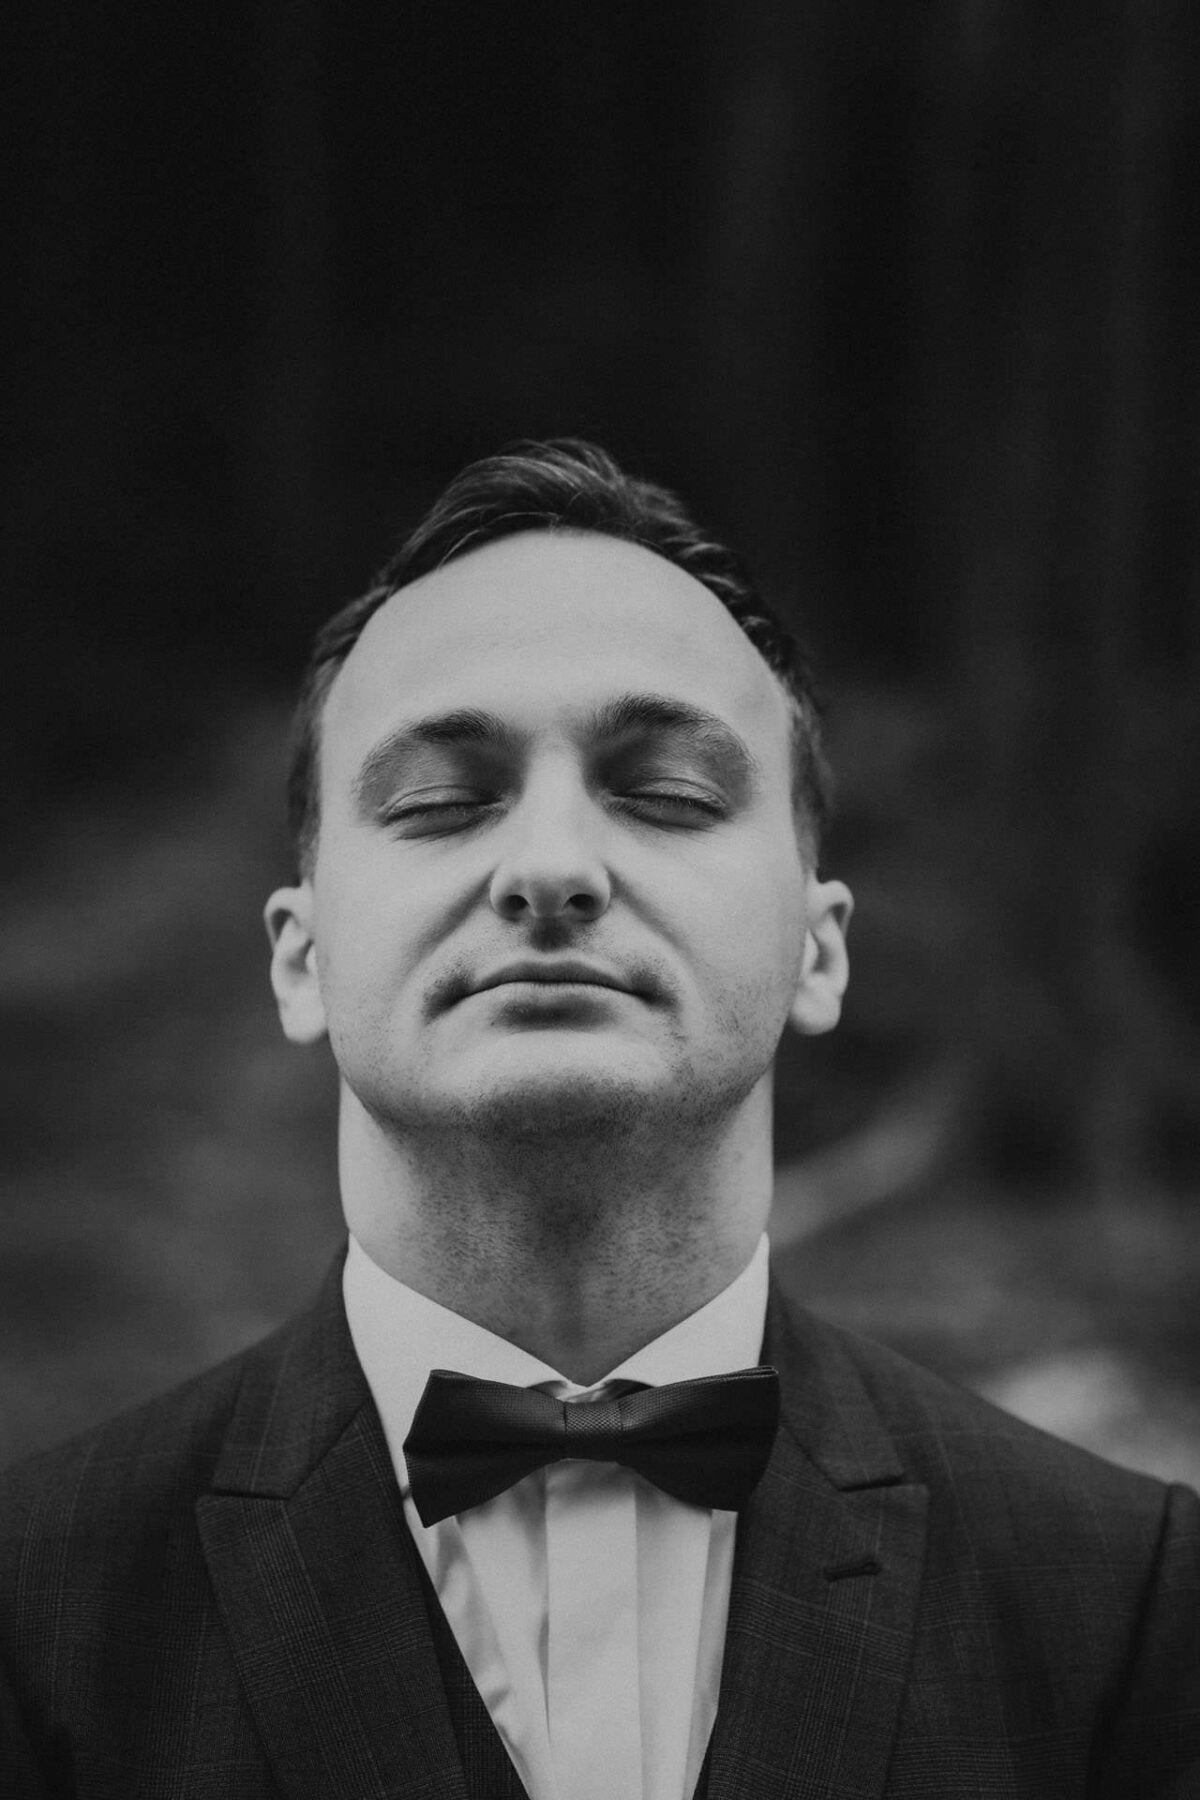 The Best of 2019 fotograf slubny Krakow 0092b